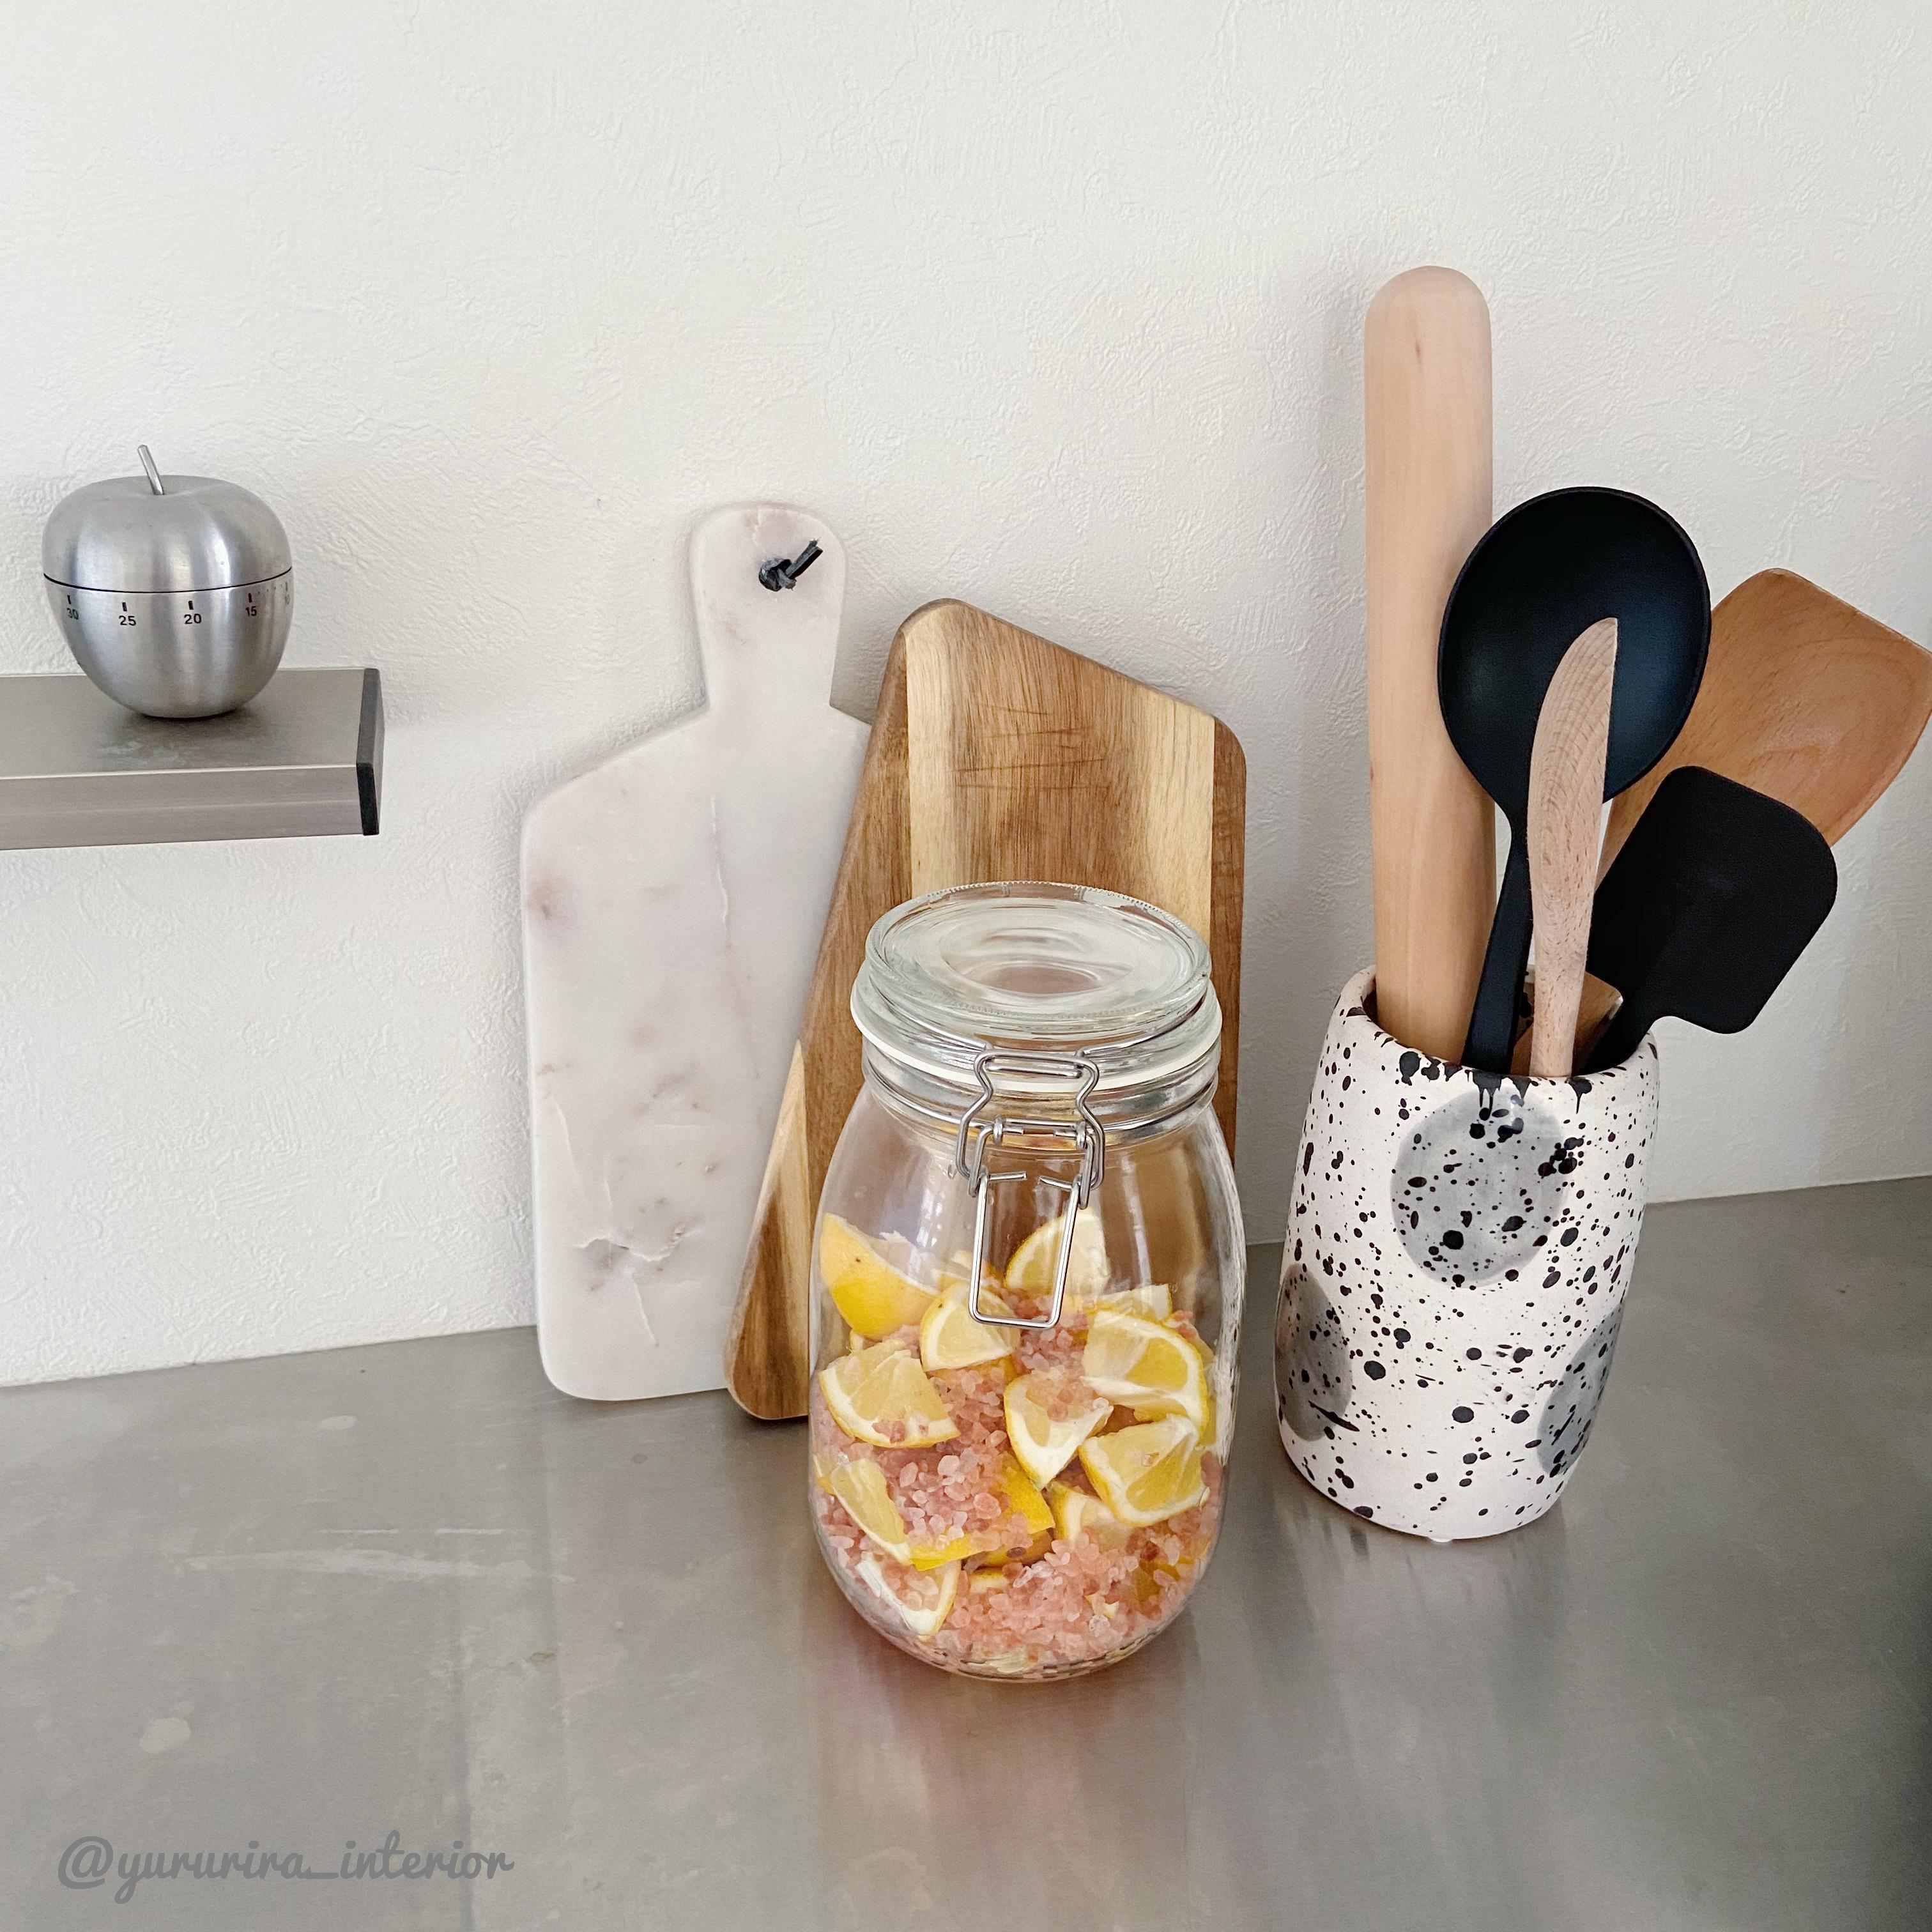 IKEAの保存容器とピンクソルトで…今さらながらの「塩レモン」作り